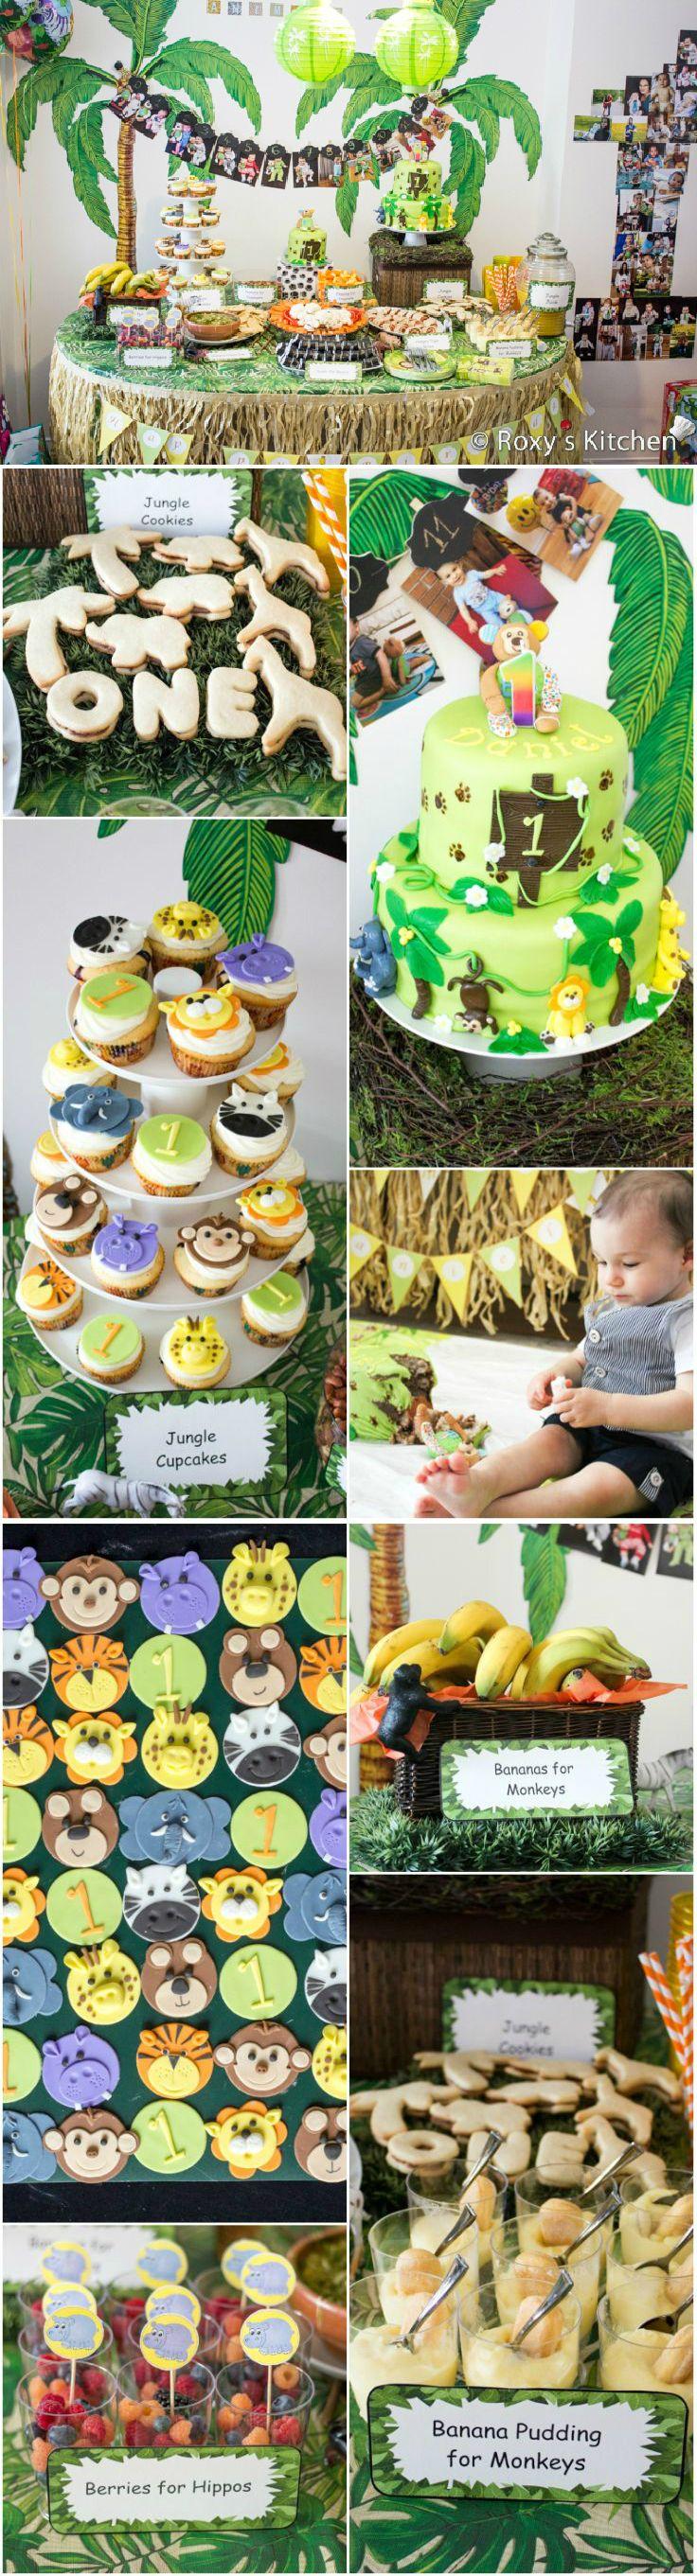 Jungle, Safari, Zoo Party Ideas and Inspirations